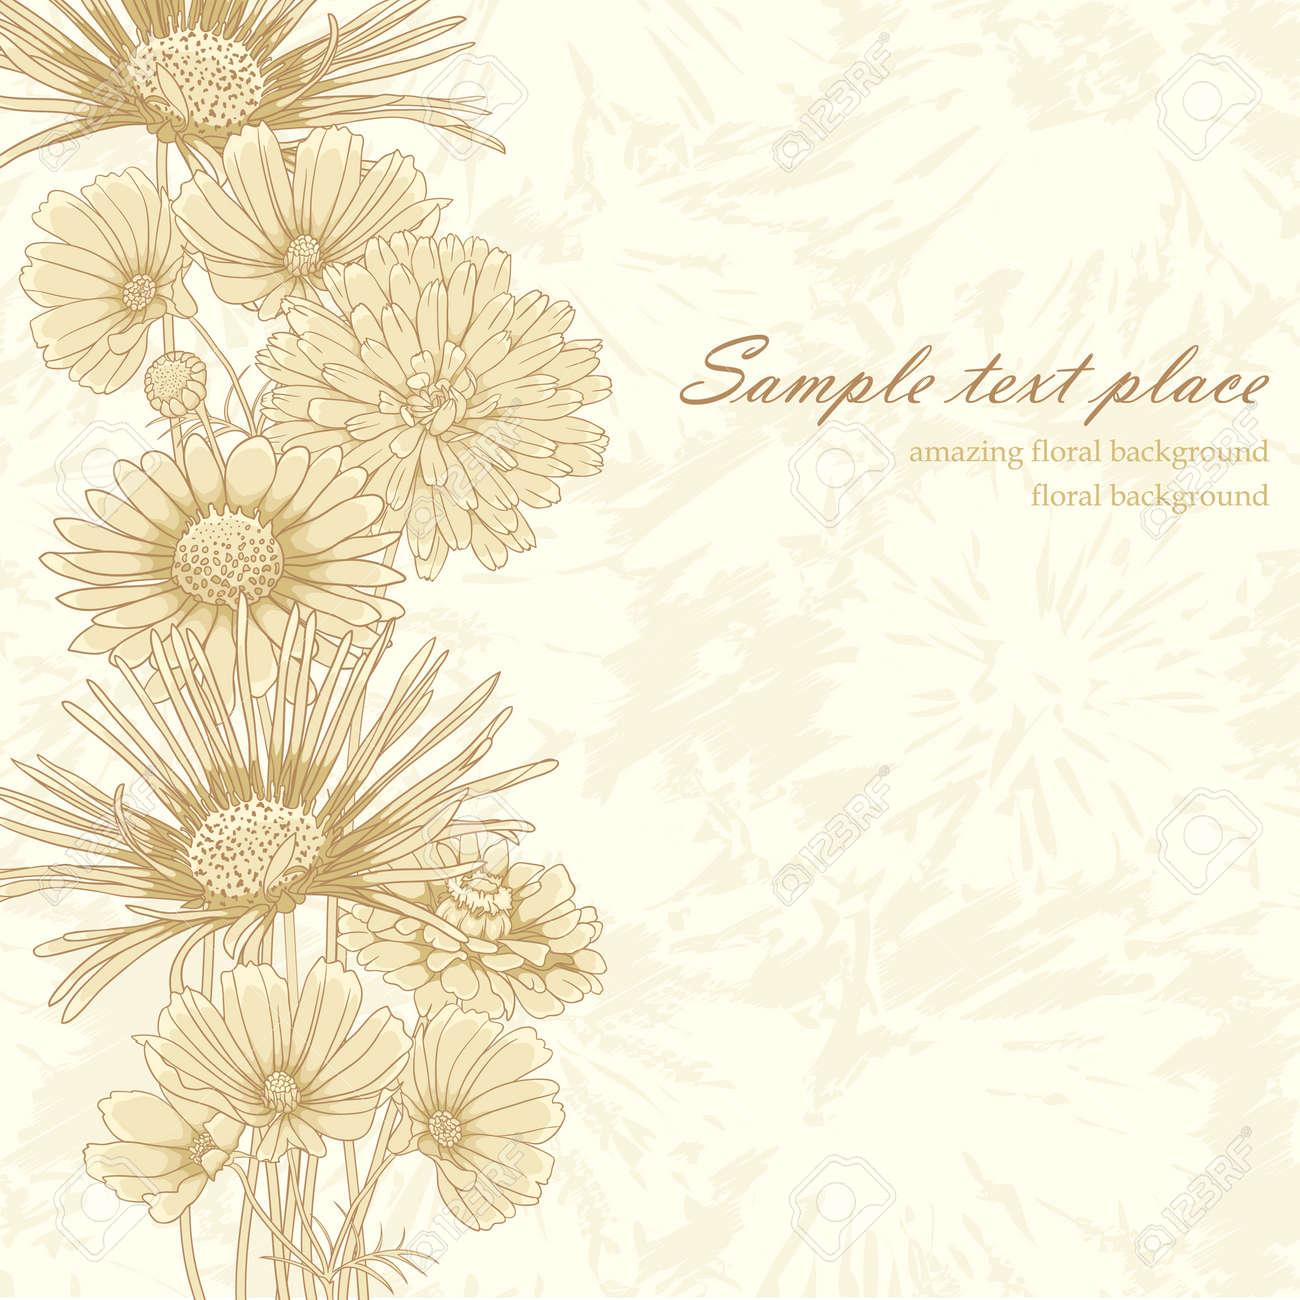 Elegant vintage floral background with set of different flowers Stock Vector - 11964887